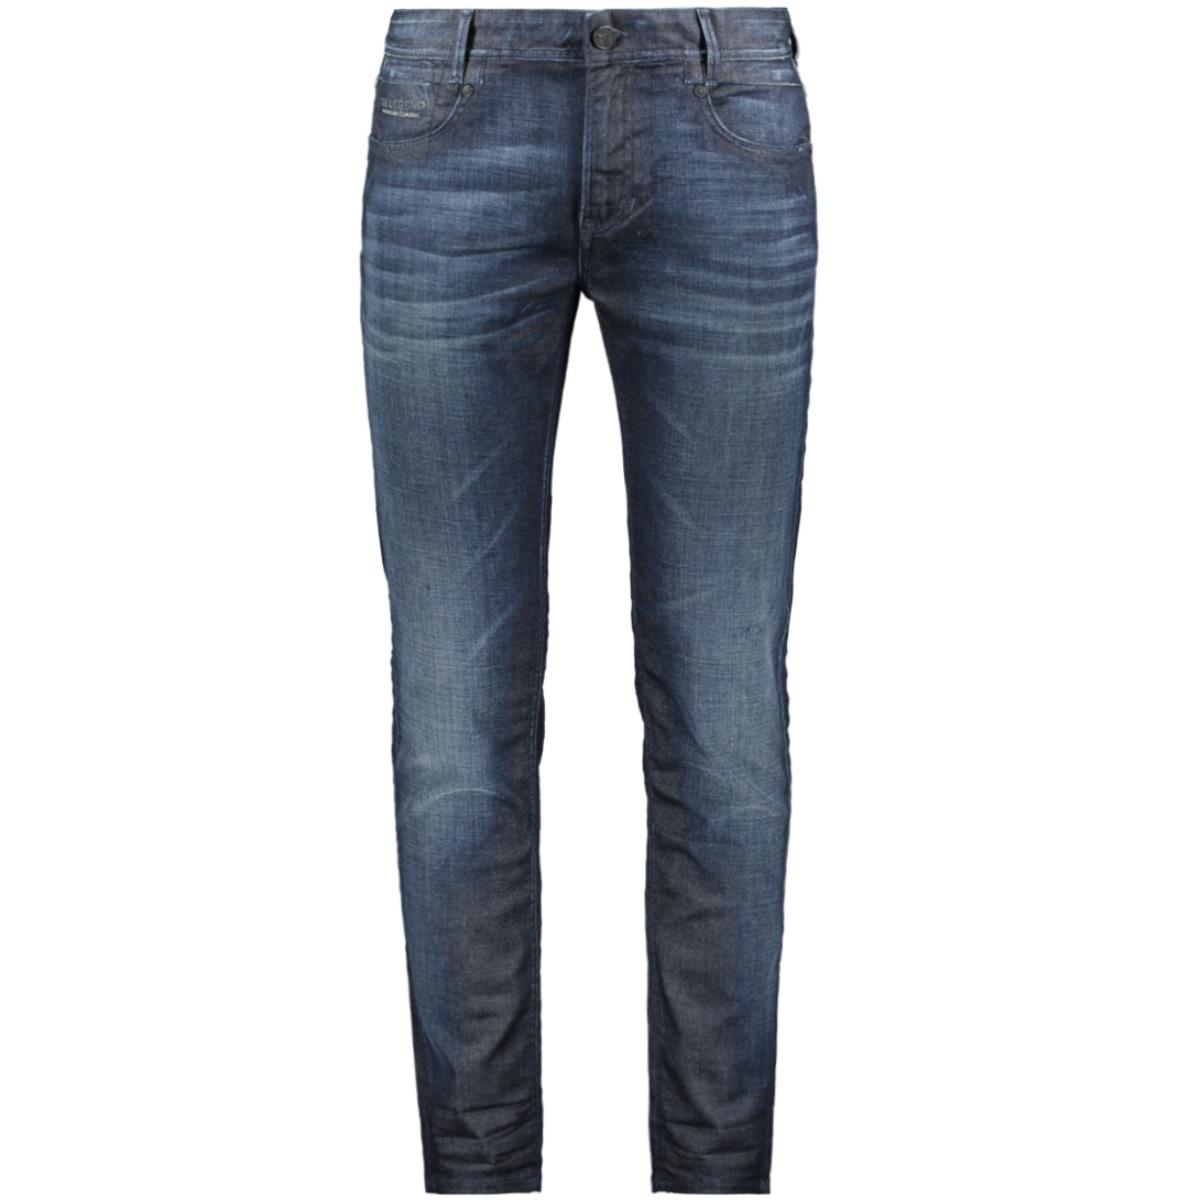 freighter dark blue denim ptr201401 pme legend jeans dbd